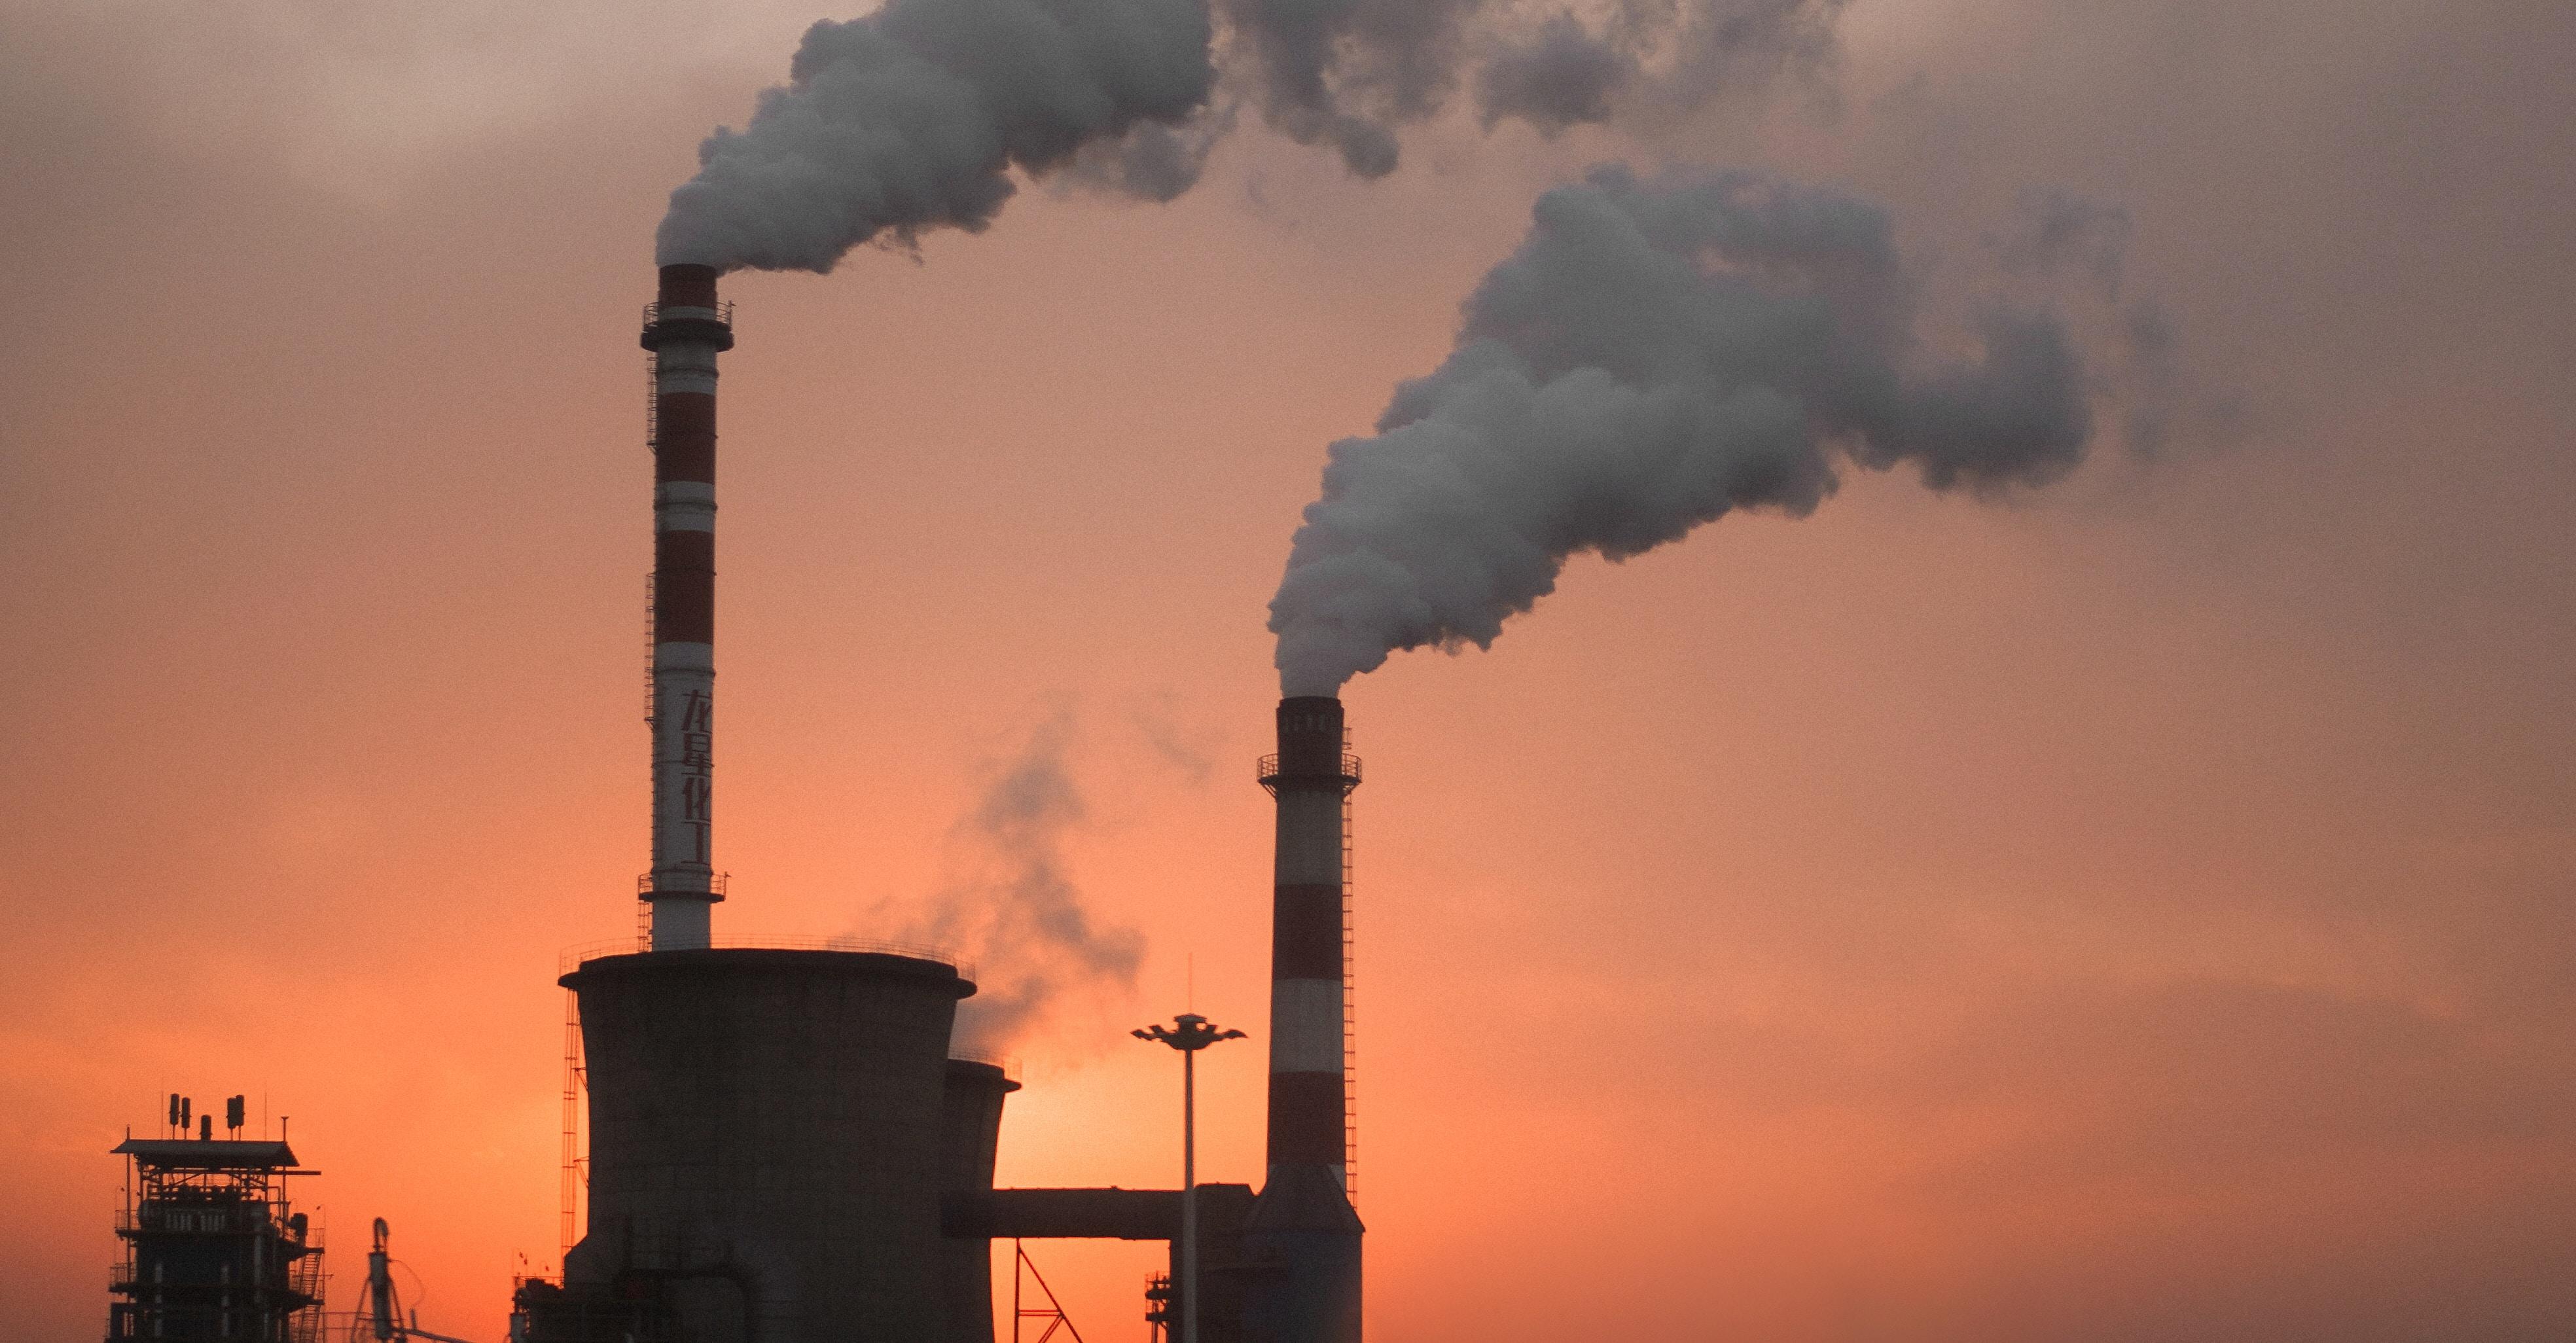 smoke leaving industrial chimneys at sunrise